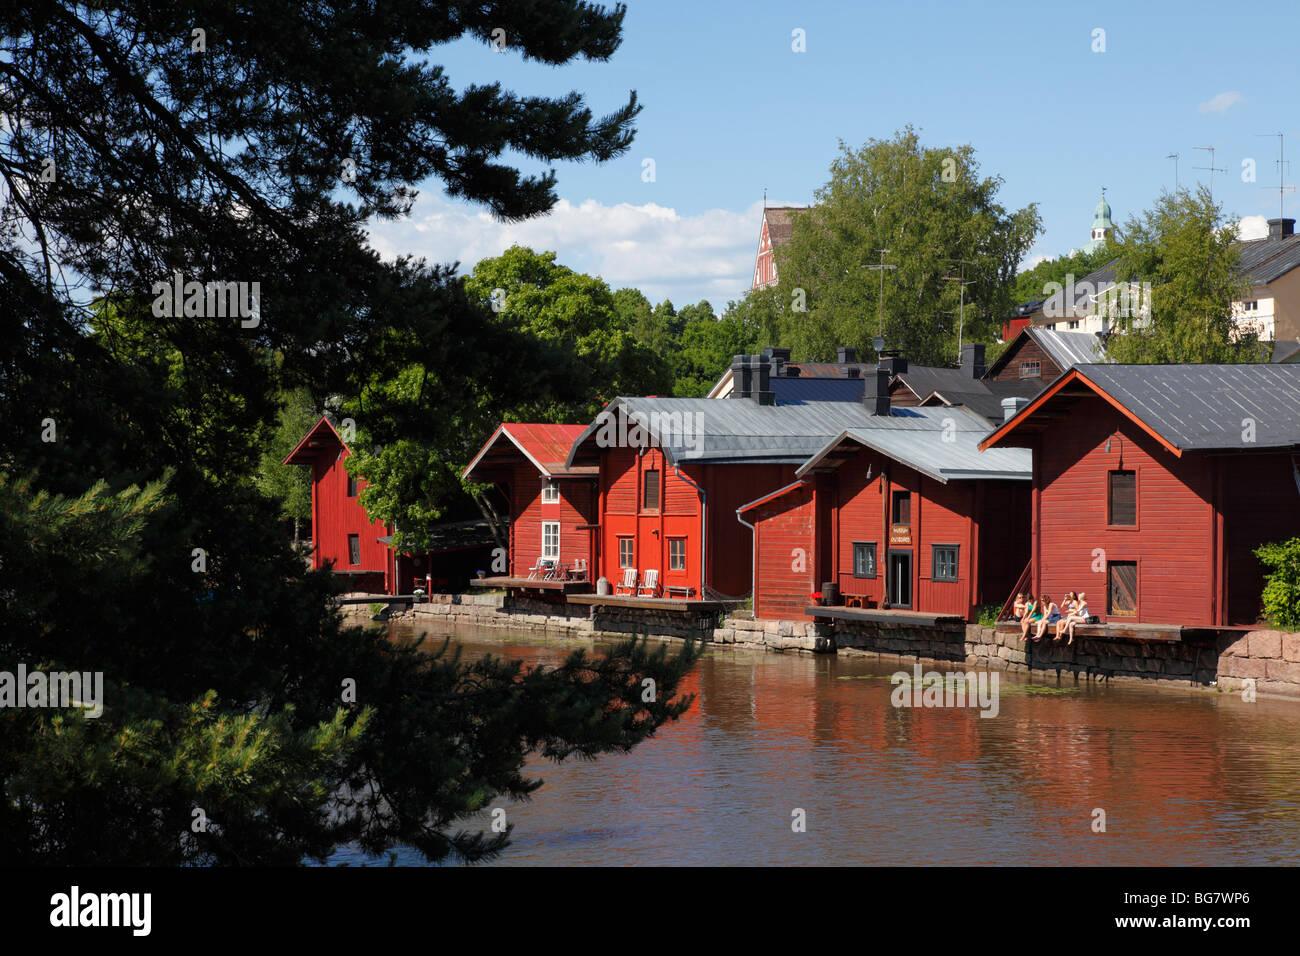 Finland, Southern Finland, Eastern Uusimaa, Porvoo, River Porvoonjoki, Medieval Red Hut Riverside Granary Warehouses - Stock Image